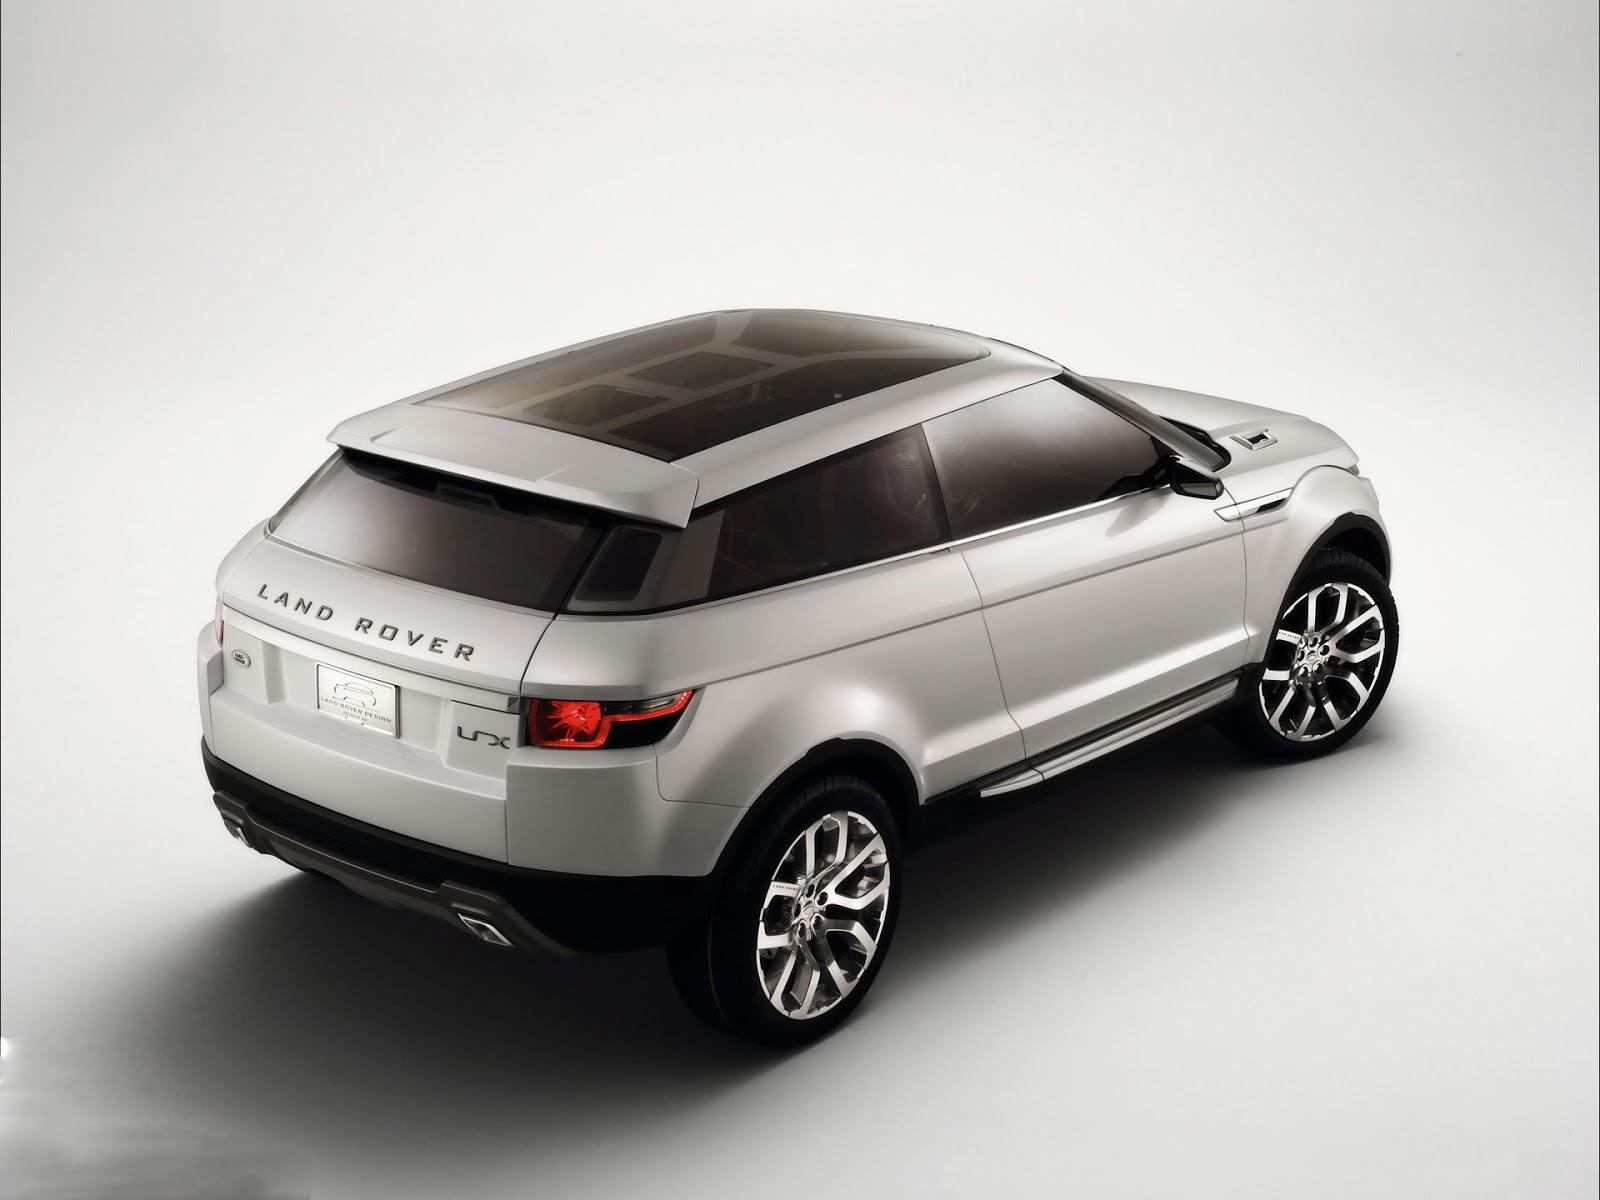 http://4.bp.blogspot.com/-Cyl2OalAE5k/UWuwyyIGbNI/AAAAAAAAQLQ/ukPDnQGDYrc/s1600/2008+Land+Rover+LRX+Concept+rear+view.jpg